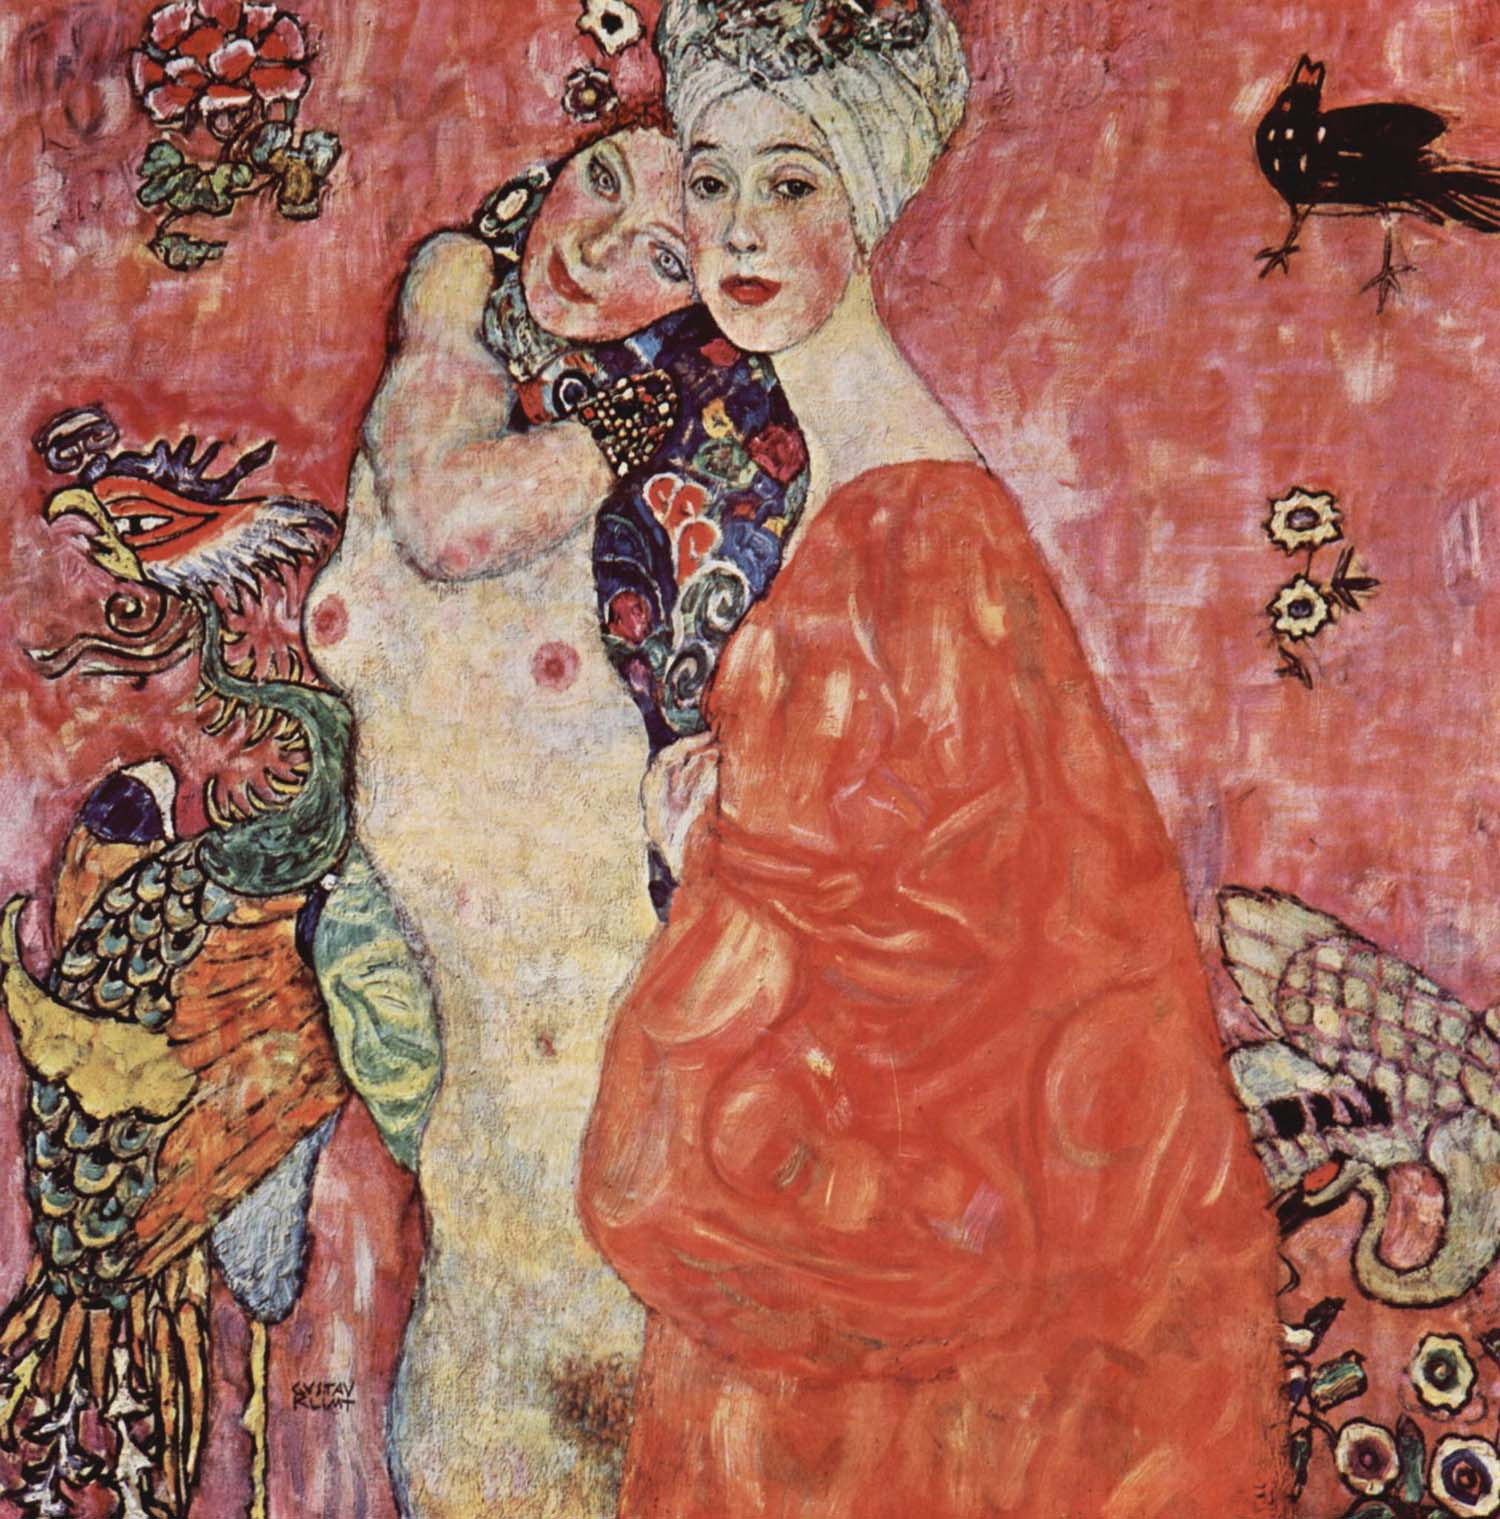 Gustav Klimt-The girlfriends Die Freundinnen 1916 Oil on canvas Destroyed by a fire set by retreating German forces in 1945